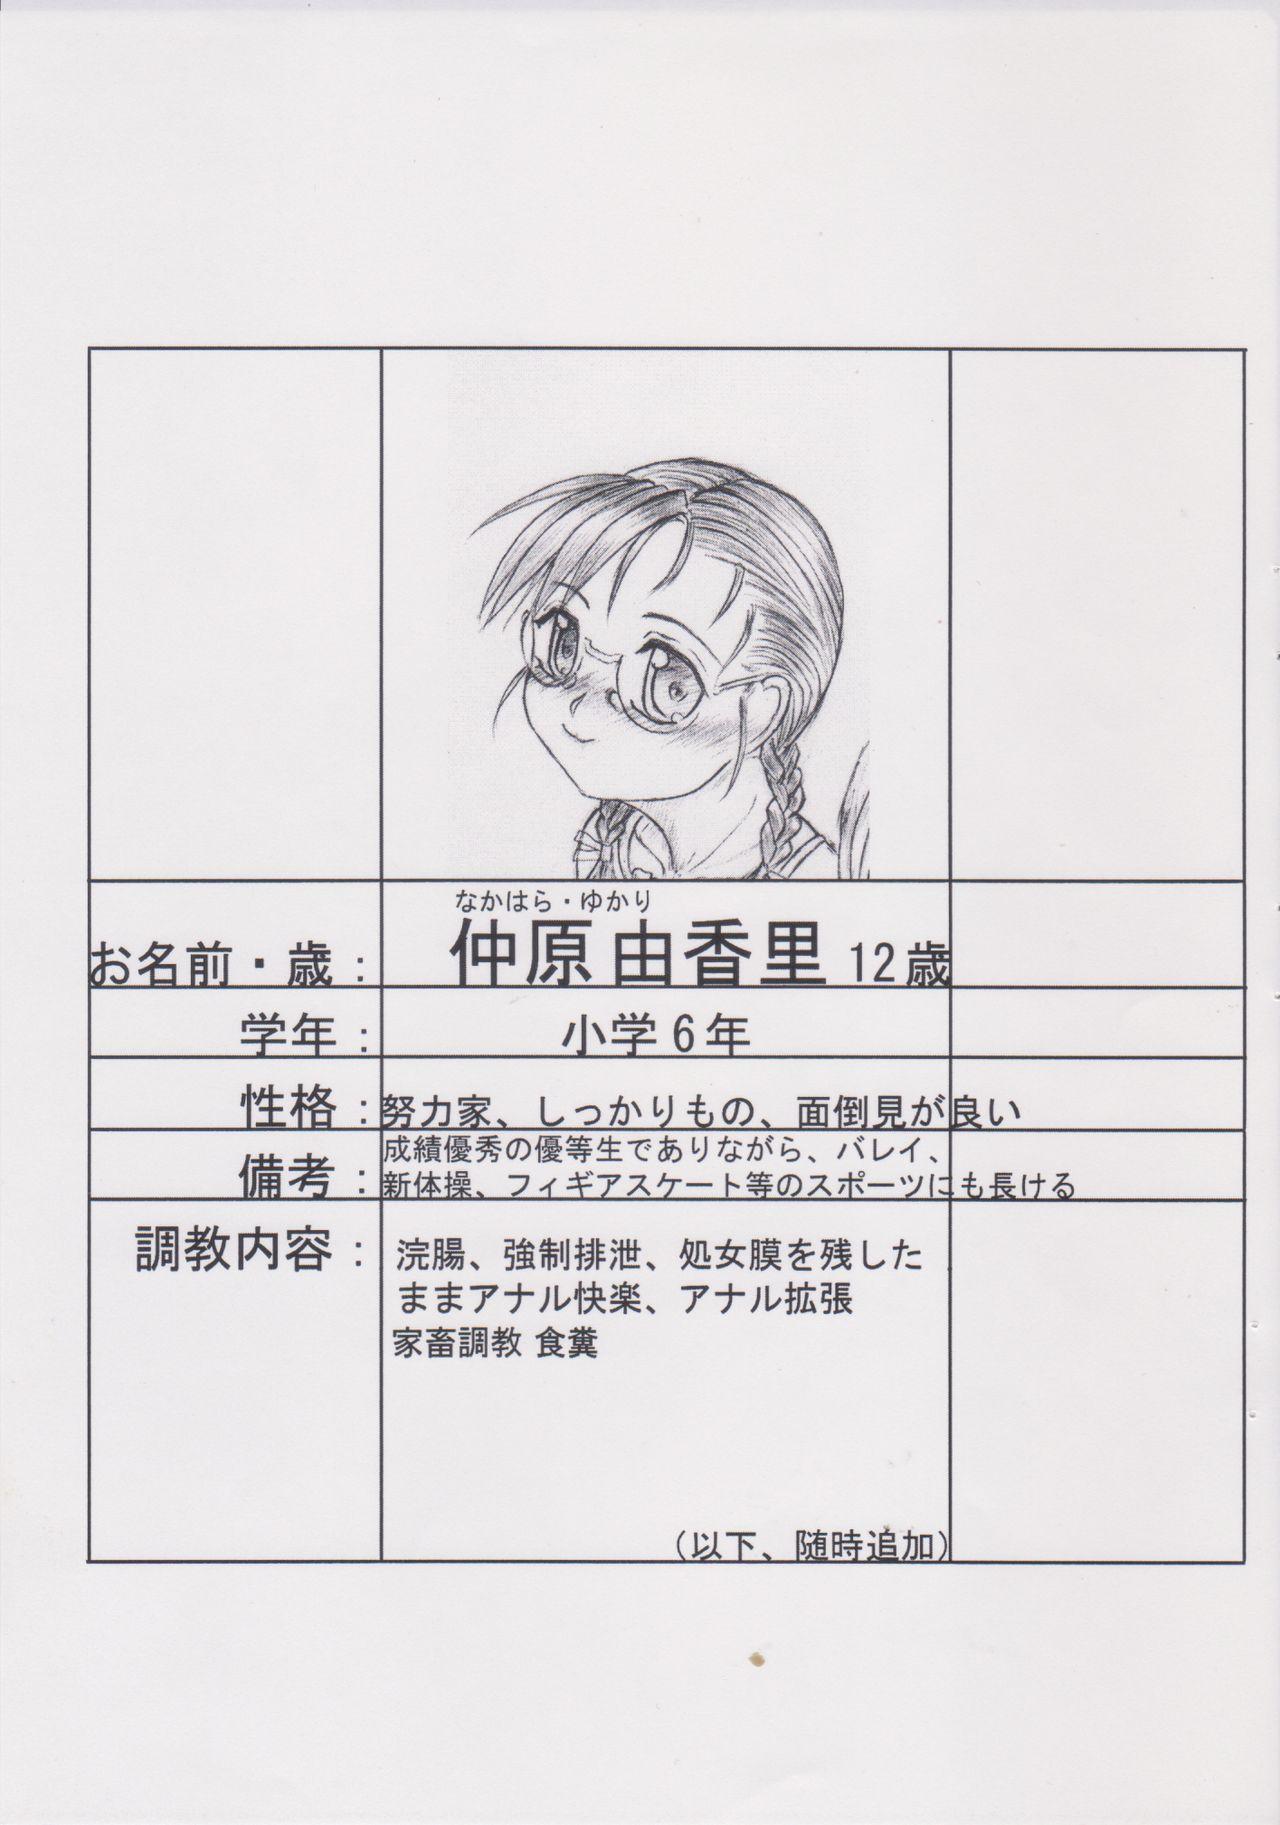 (C78) [Nekoneko Panchu! (Nekoneko Panchu)] Sanshimai Choukyou Yuugi [Yukari Hen] Yukari-chan no Butabana Kachiku Choukyou [Anal Higyaku Jugyou] 1